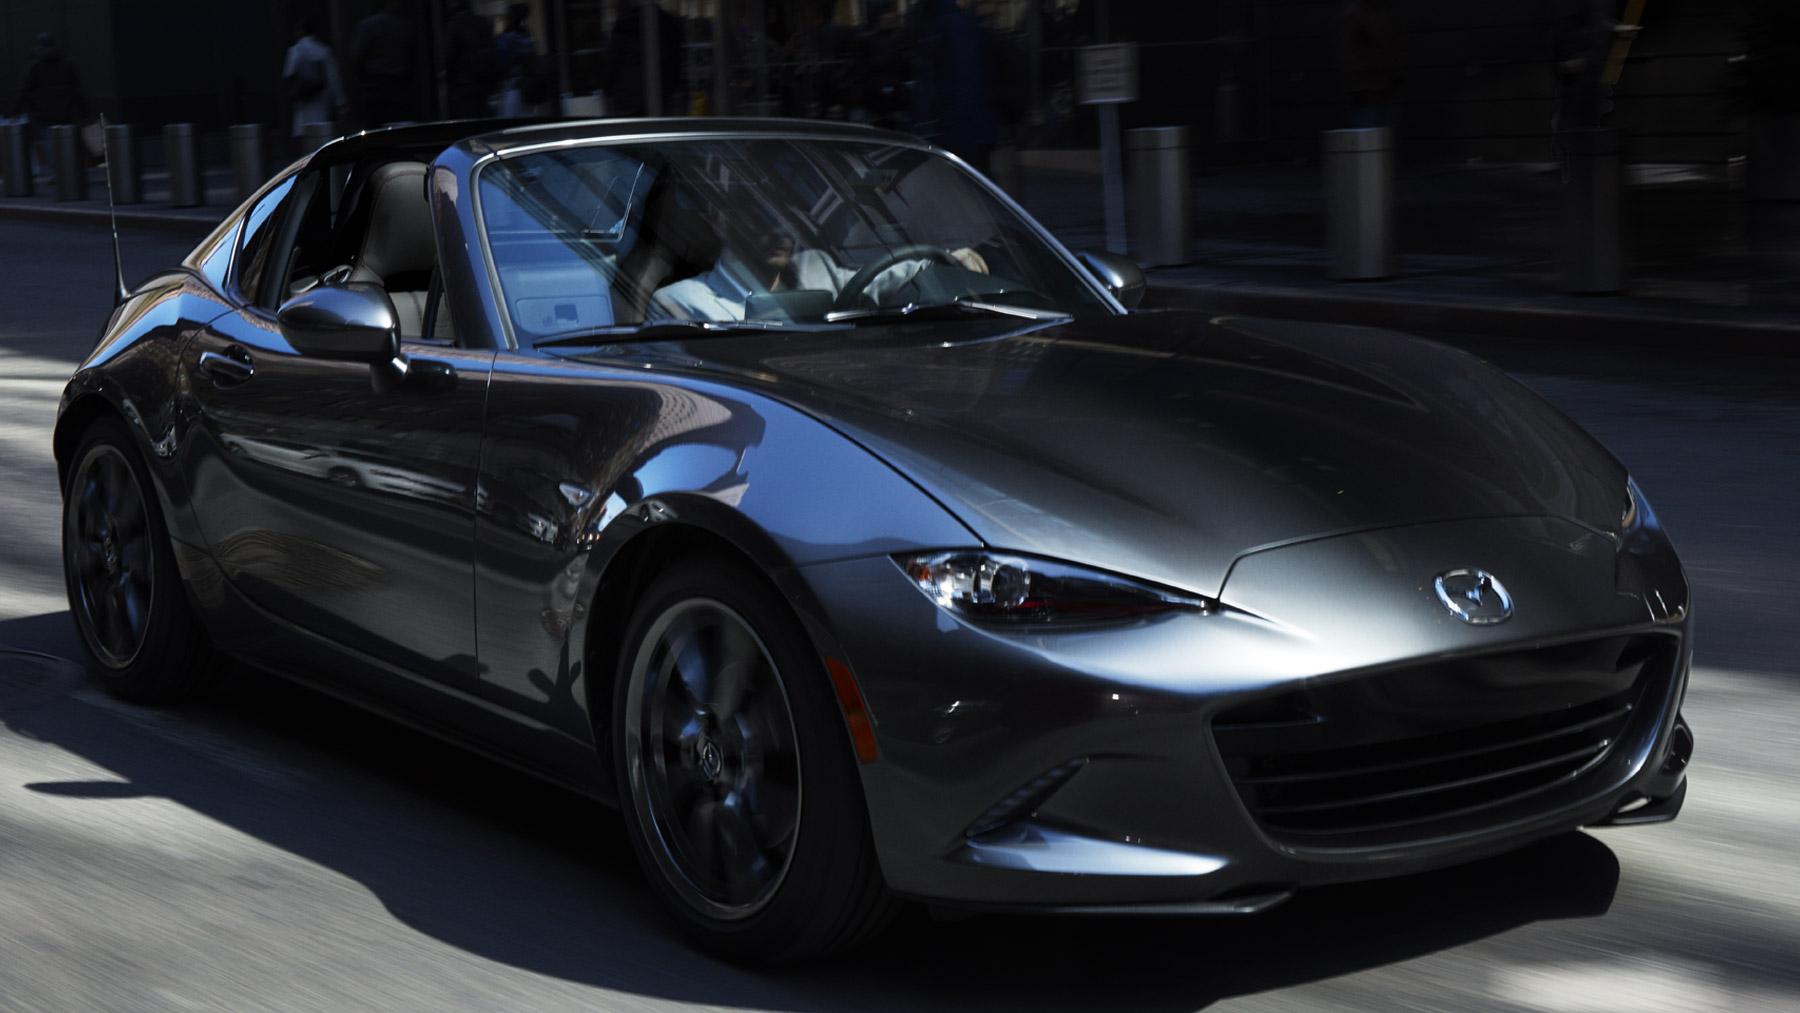 2017 Mazda Mx 5 Miata Rf Grand Touring >> 2017 Mazda MX-5 Miata RF Hard Top Convertible | Mazda USA